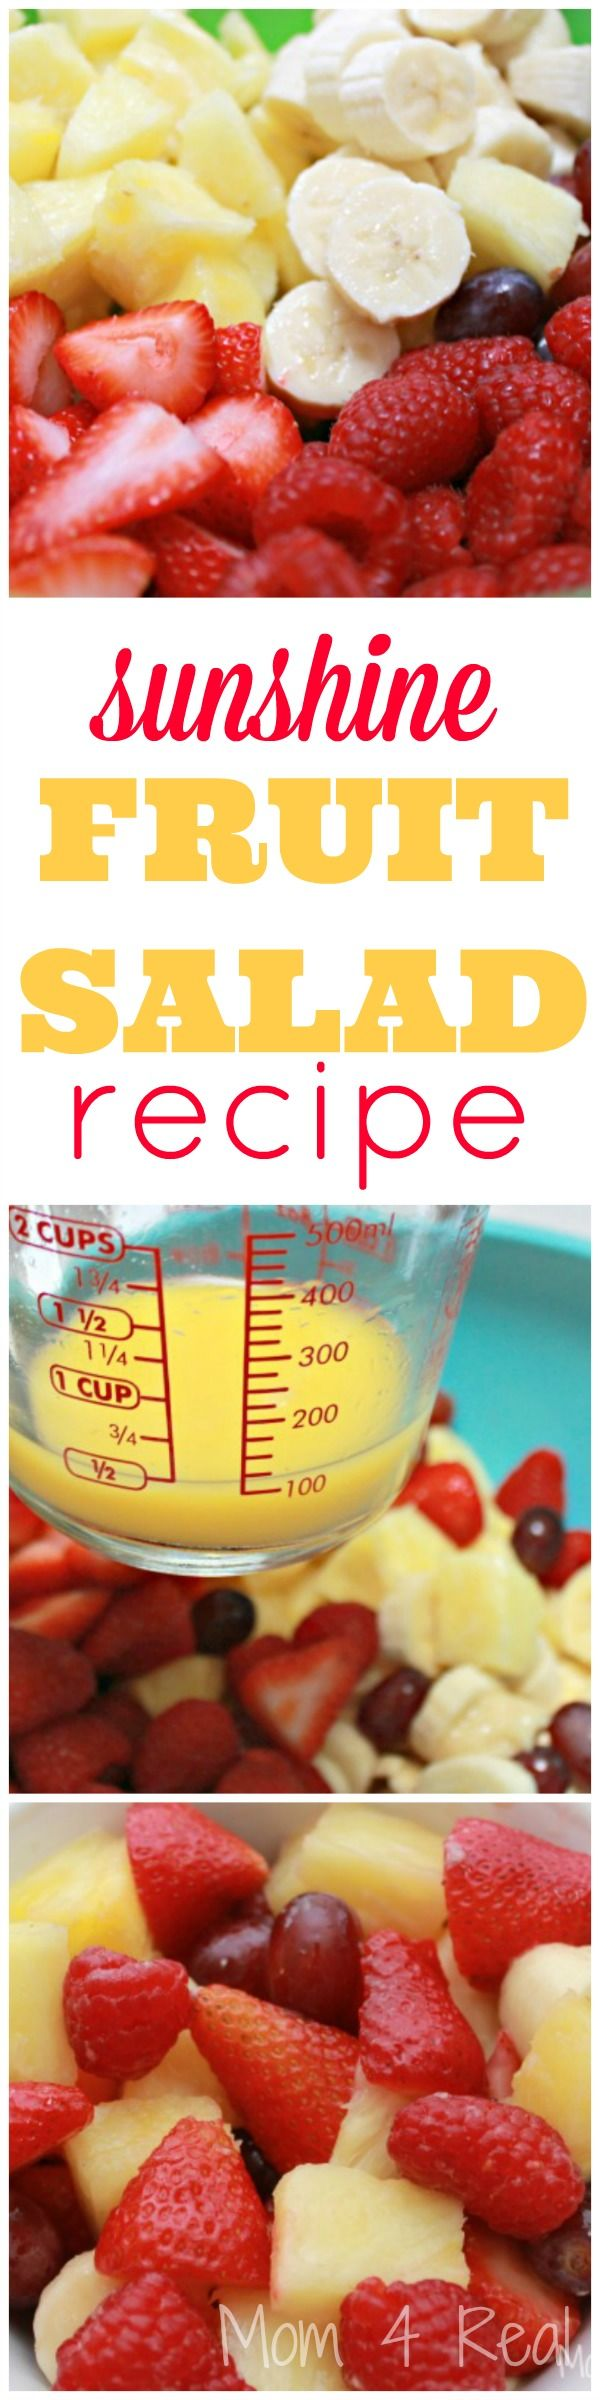 Sunshine Fruit Salad Recipe - Mom 4 Real